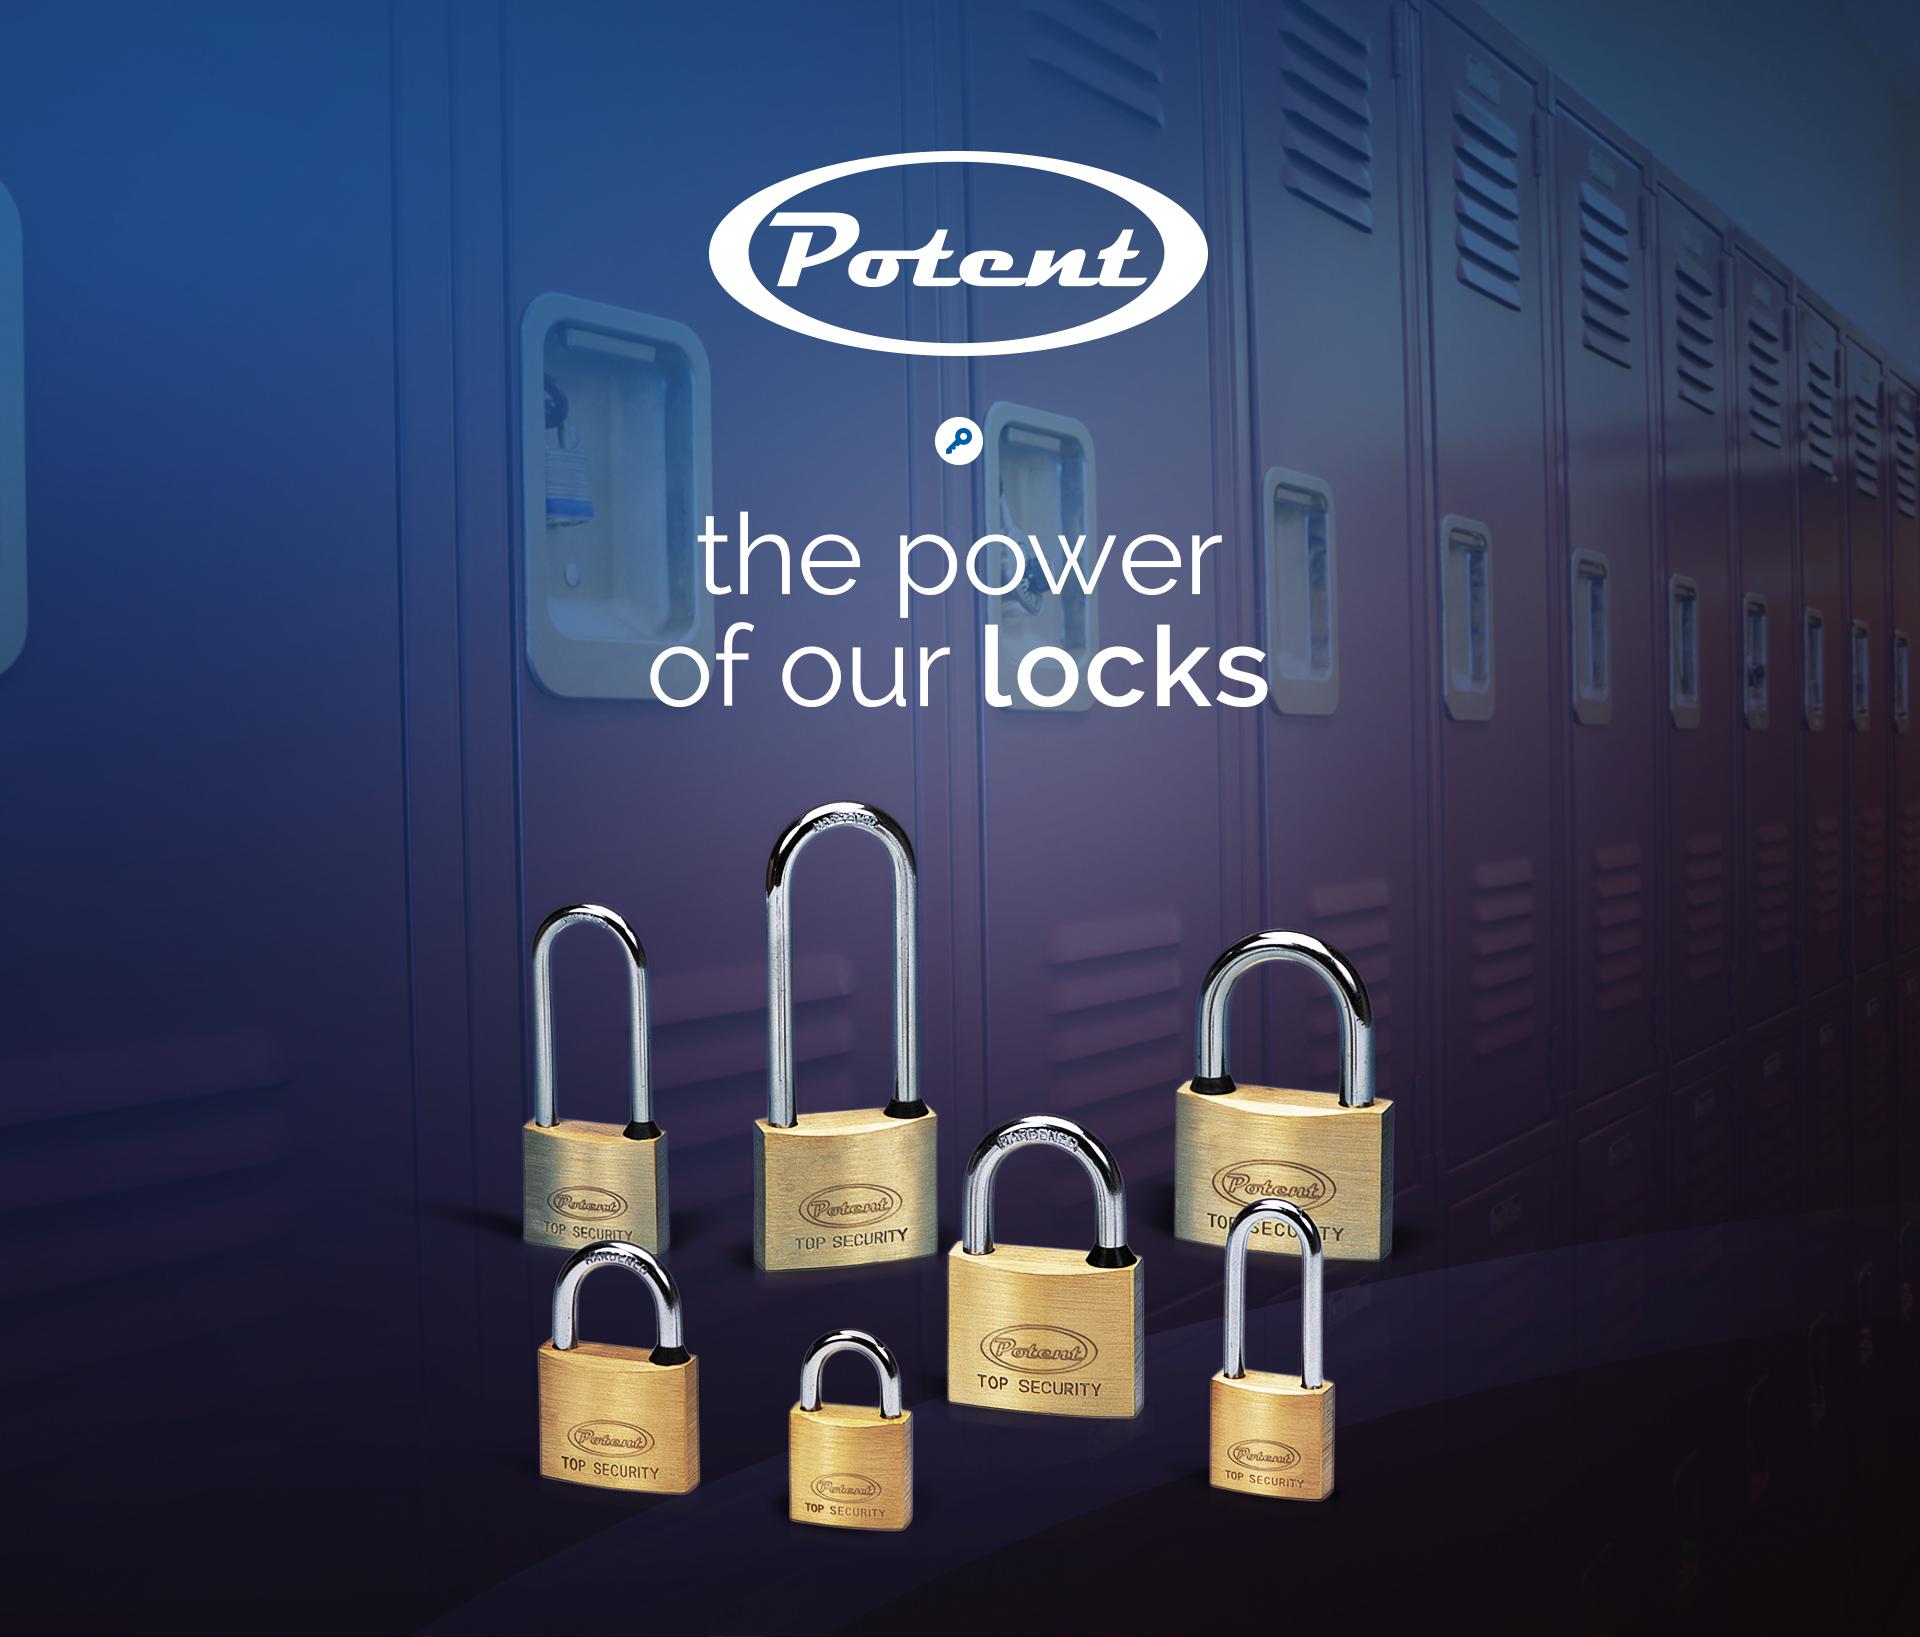 Potent locks